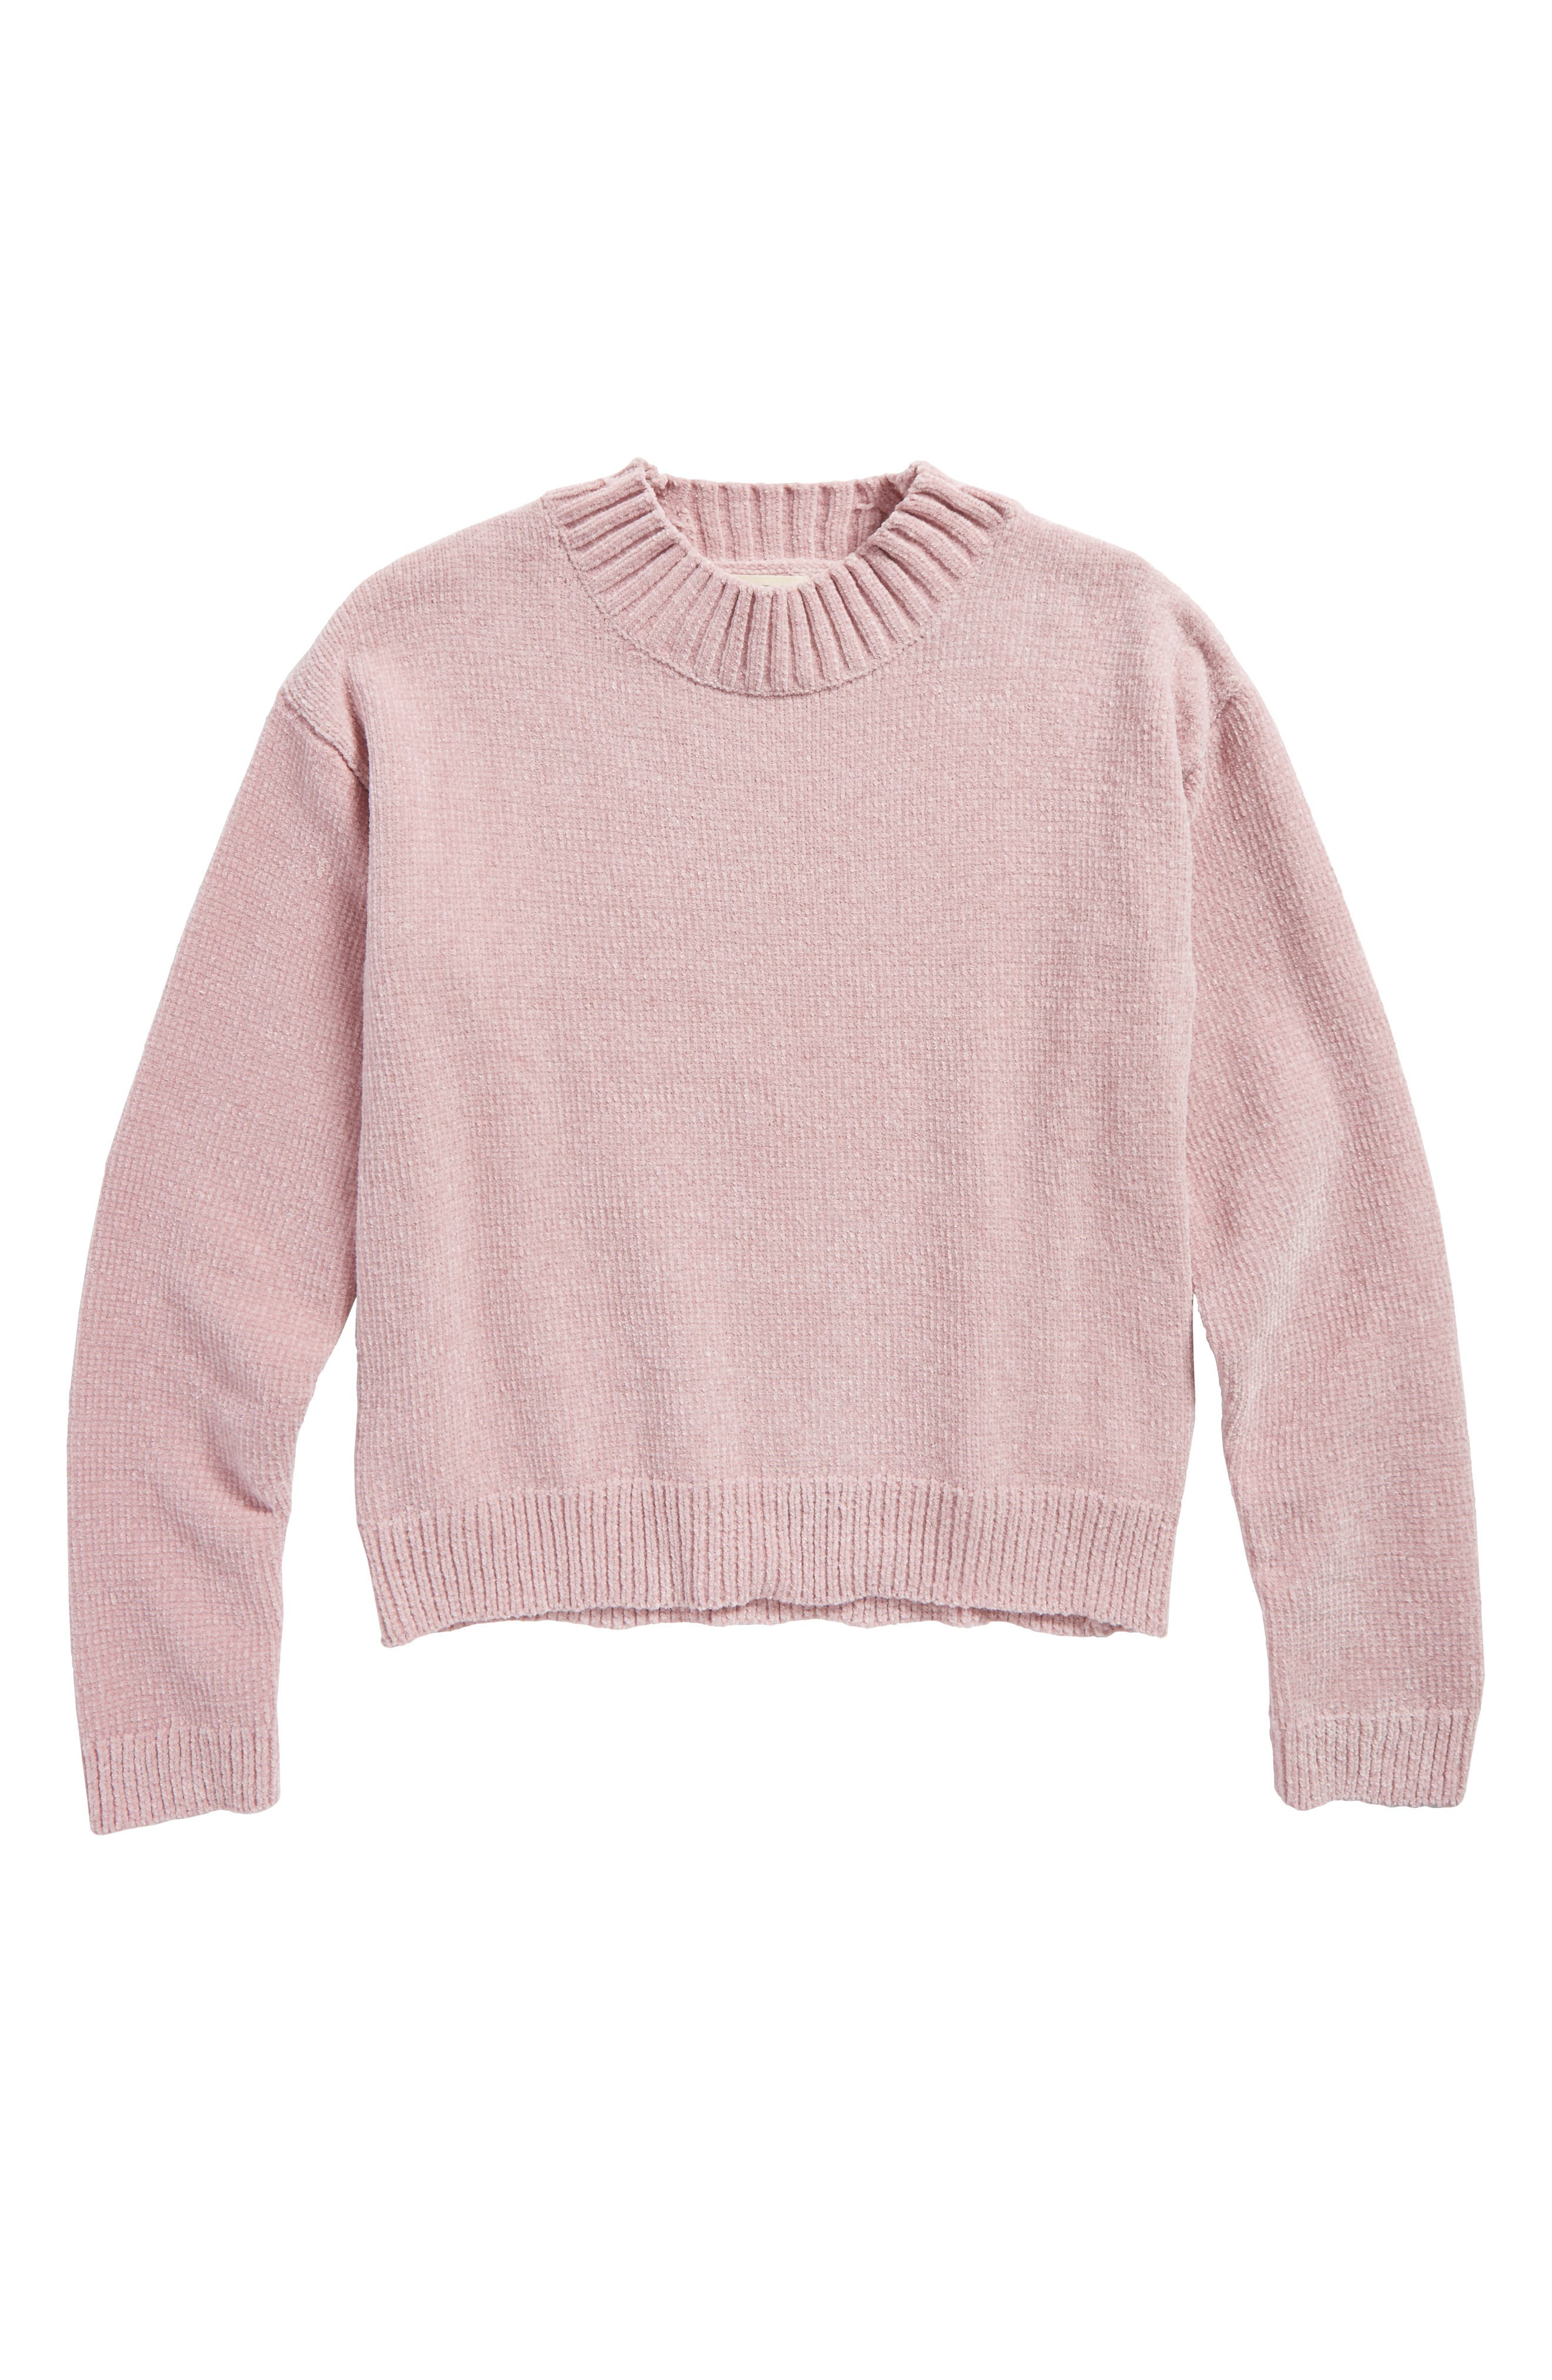 Main Image - Tucker + Tate Chenille Mock Neck Sweater (Big Girls)